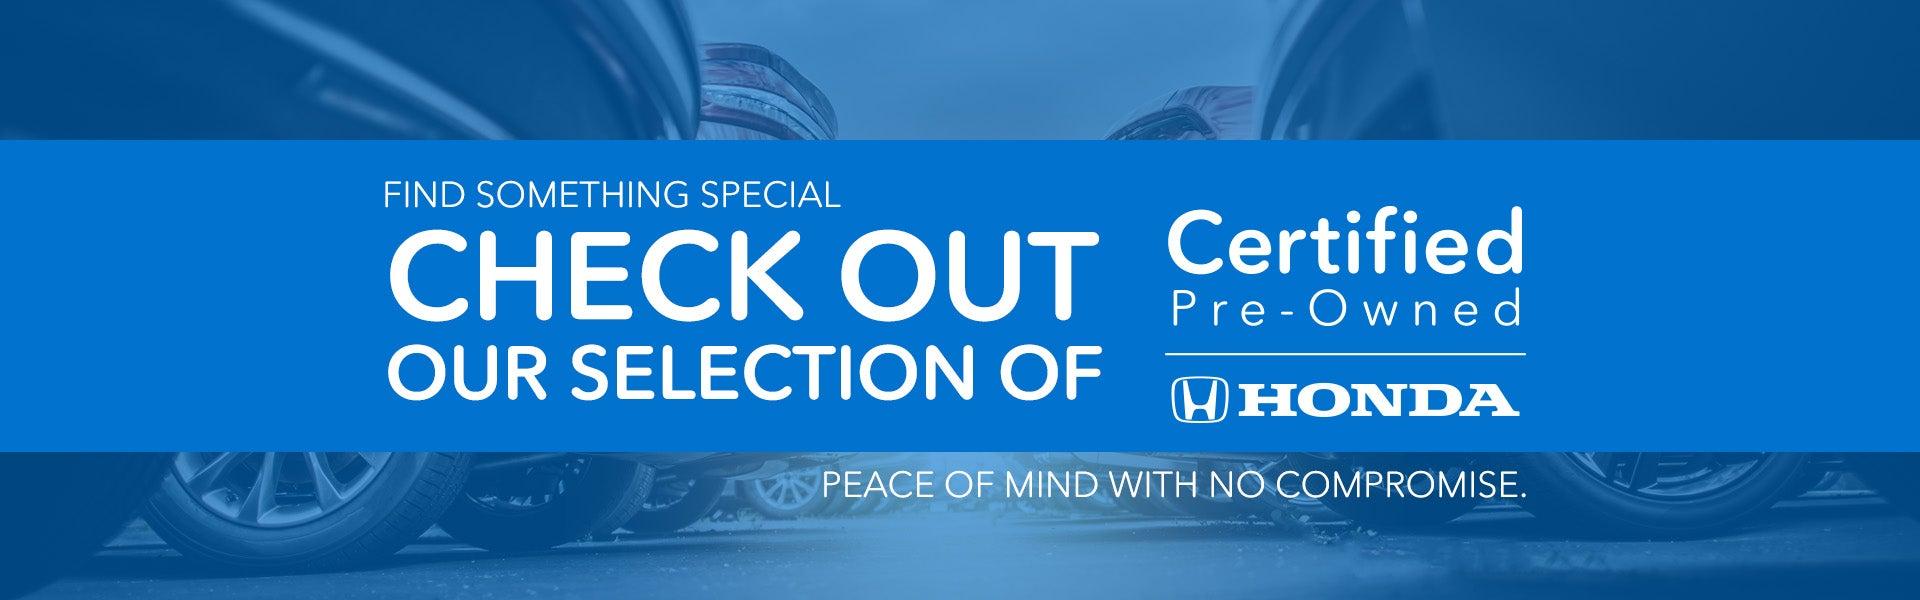 Why Buy Cpo Honda Certified Pre Owned Benefits Clinton Honda